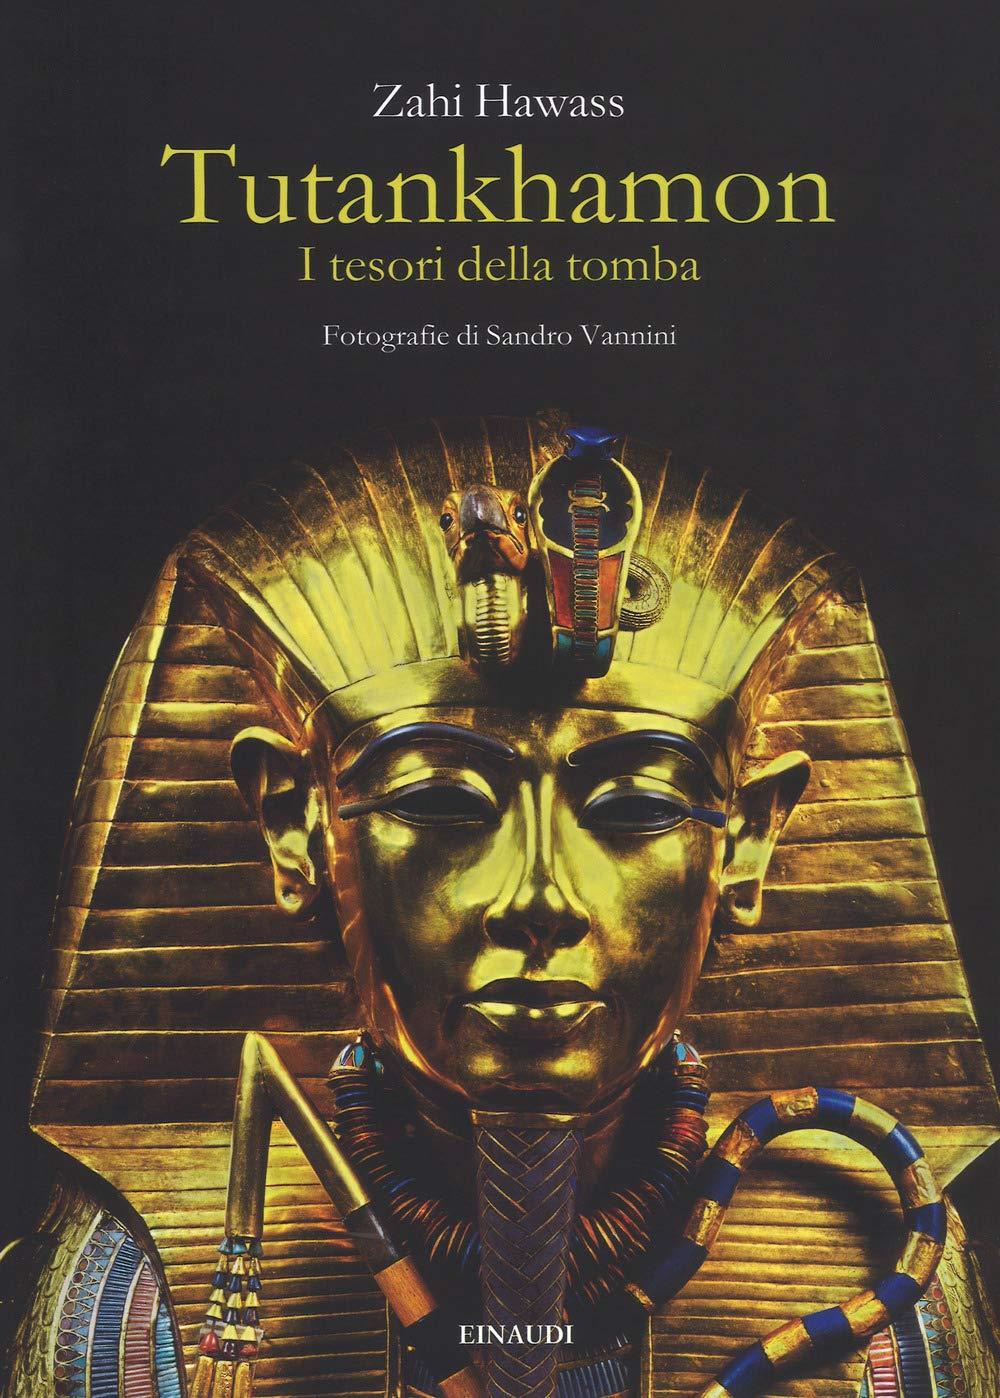 Tutankhamon. I tesori della tomba. Ediz. a colori Grandi opere: Amazon.es: Hawass, Zahi, Vannini, S., Cordani, V.: Libros en idiomas extranjeros